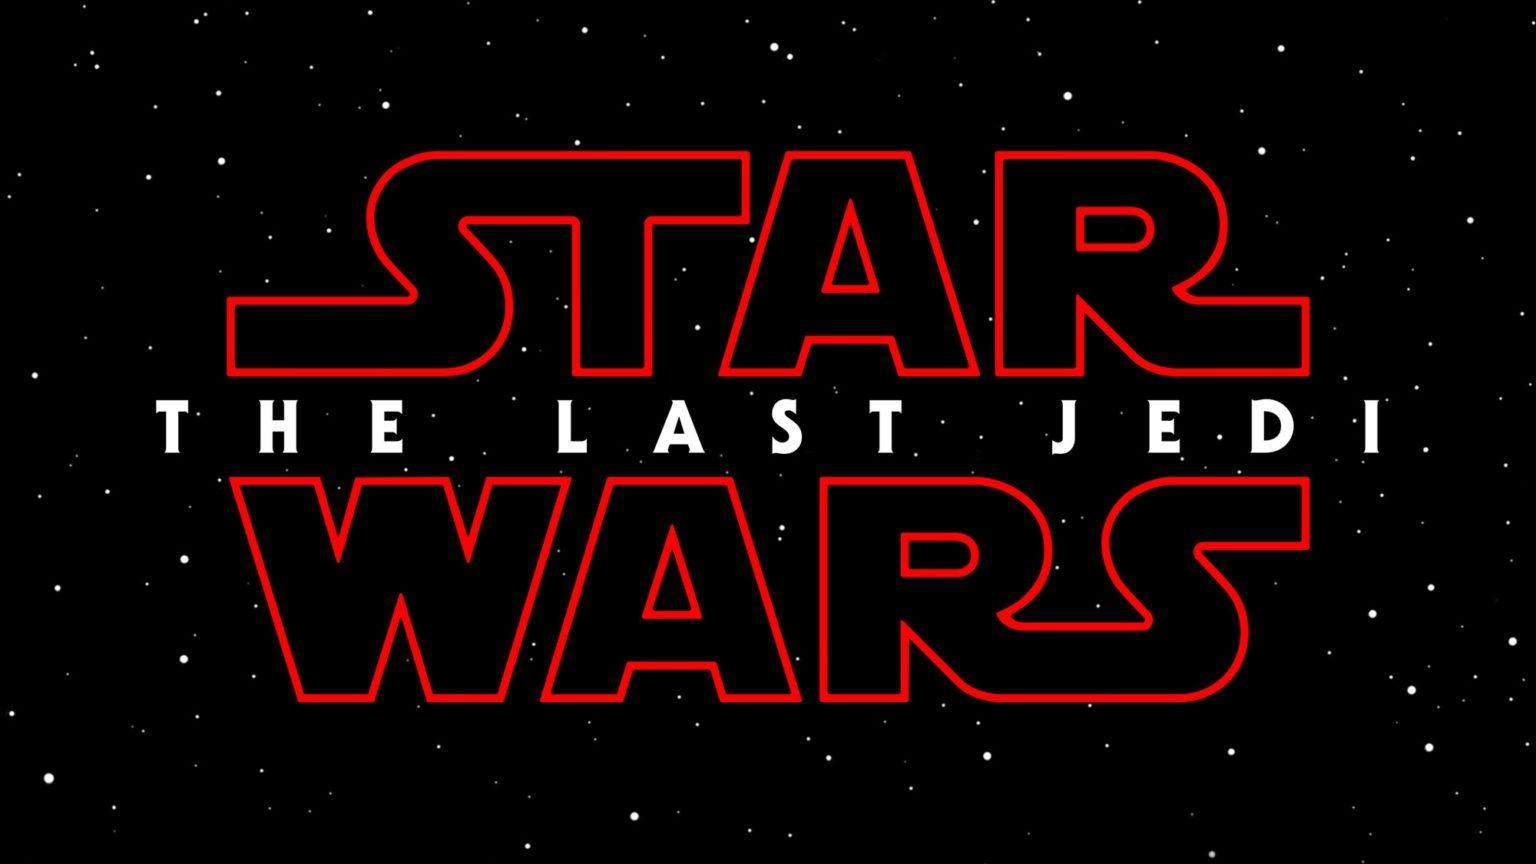 star-wars-the-last-jedi-disney-episode-viii.jpg